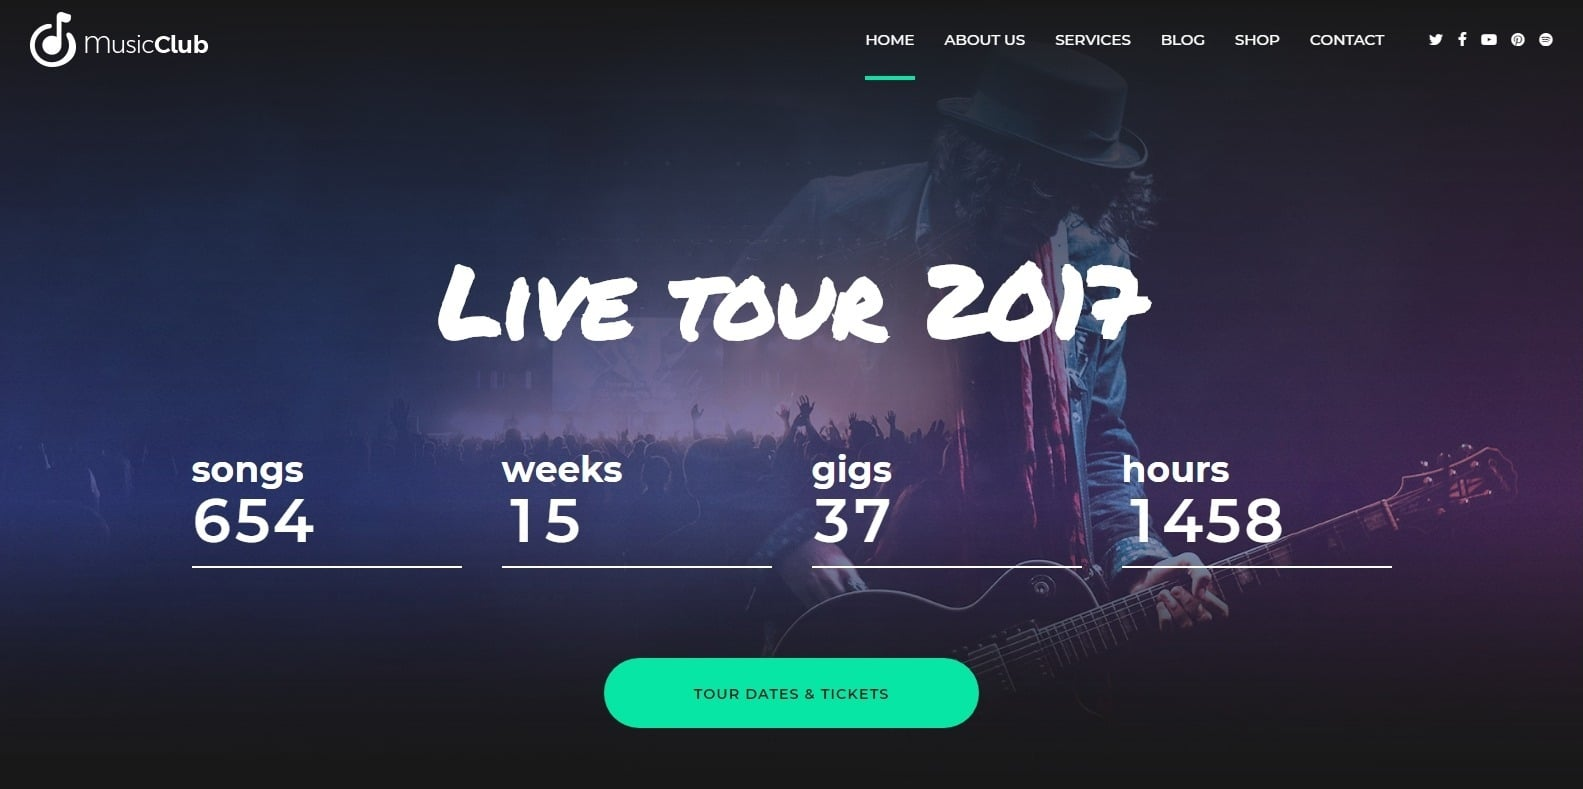 music-club-dj-website-template